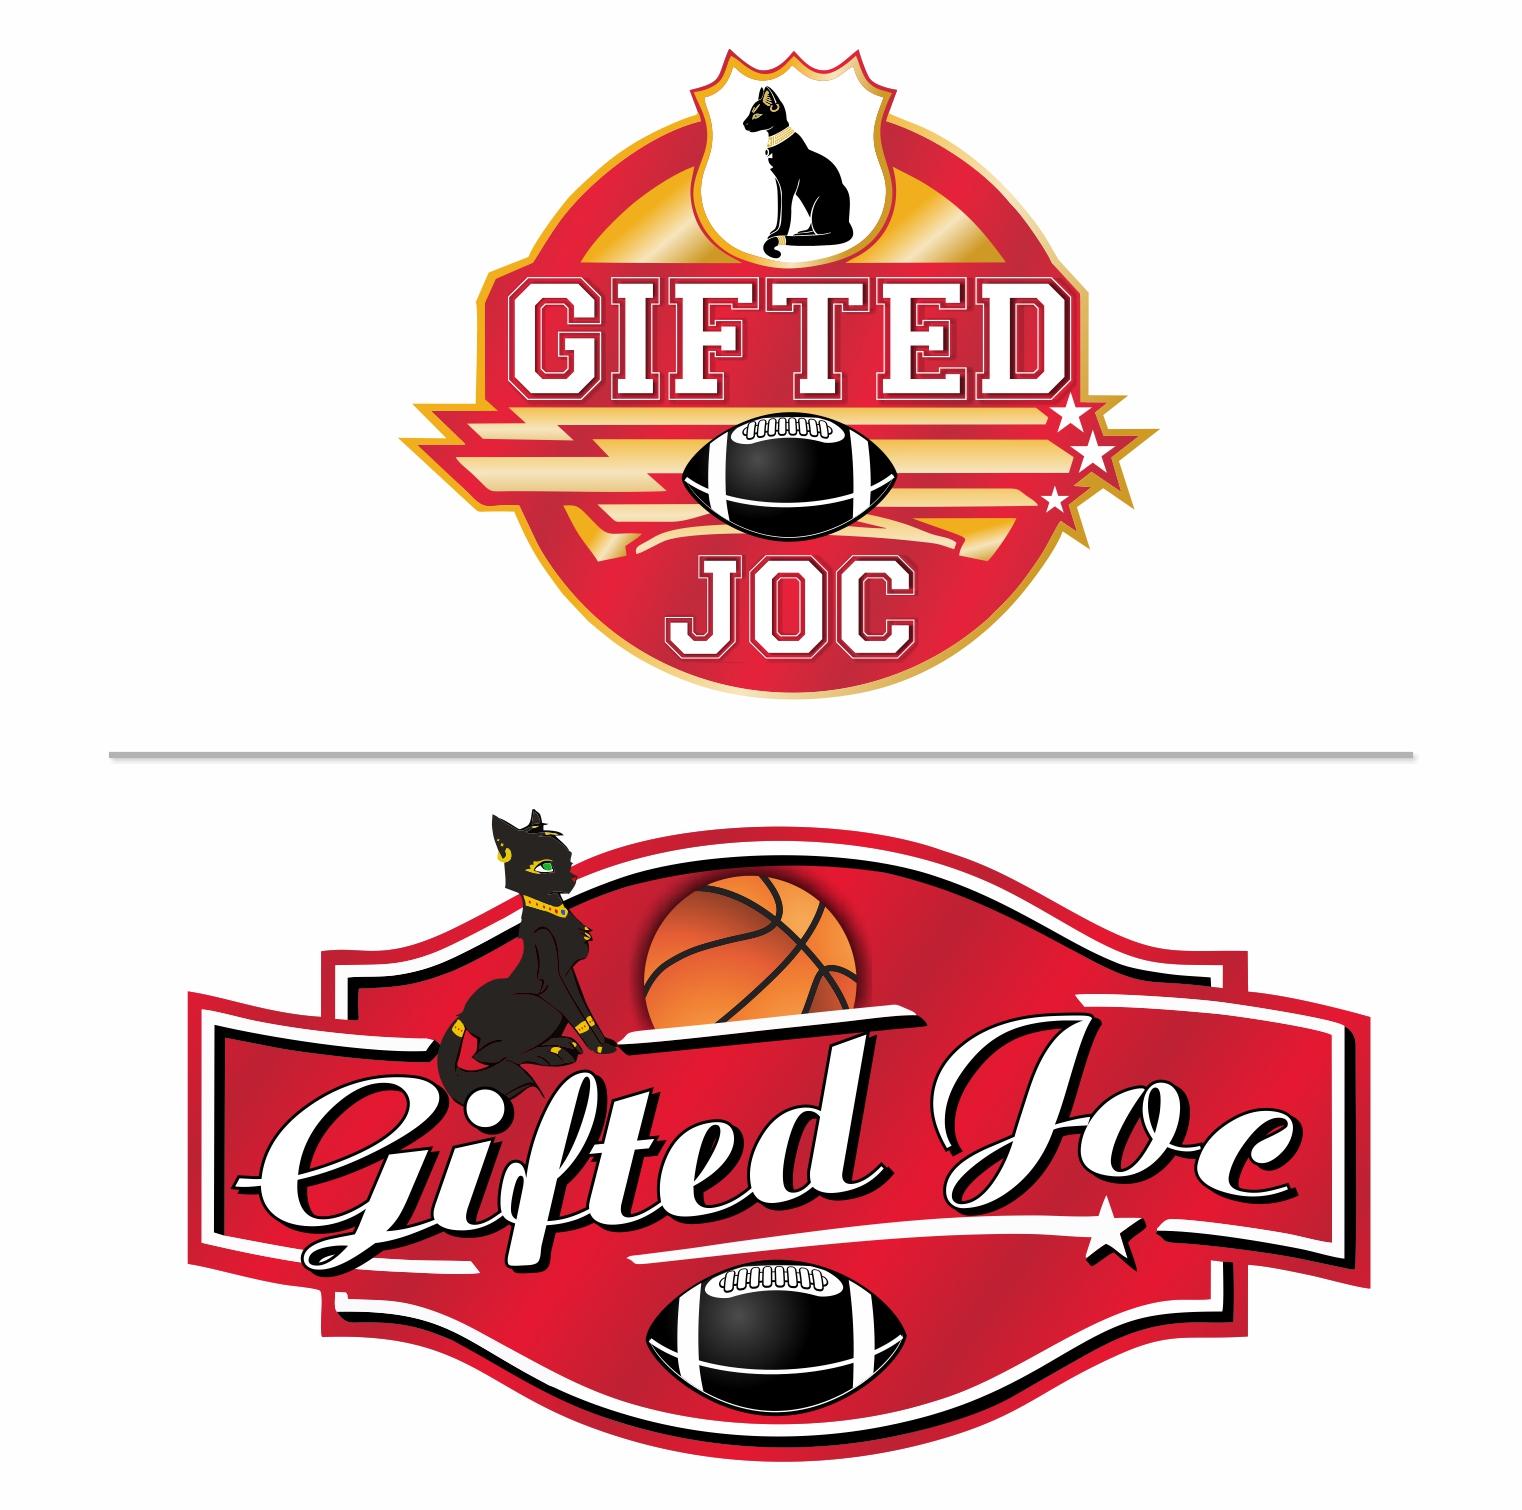 Gifted Joc logos